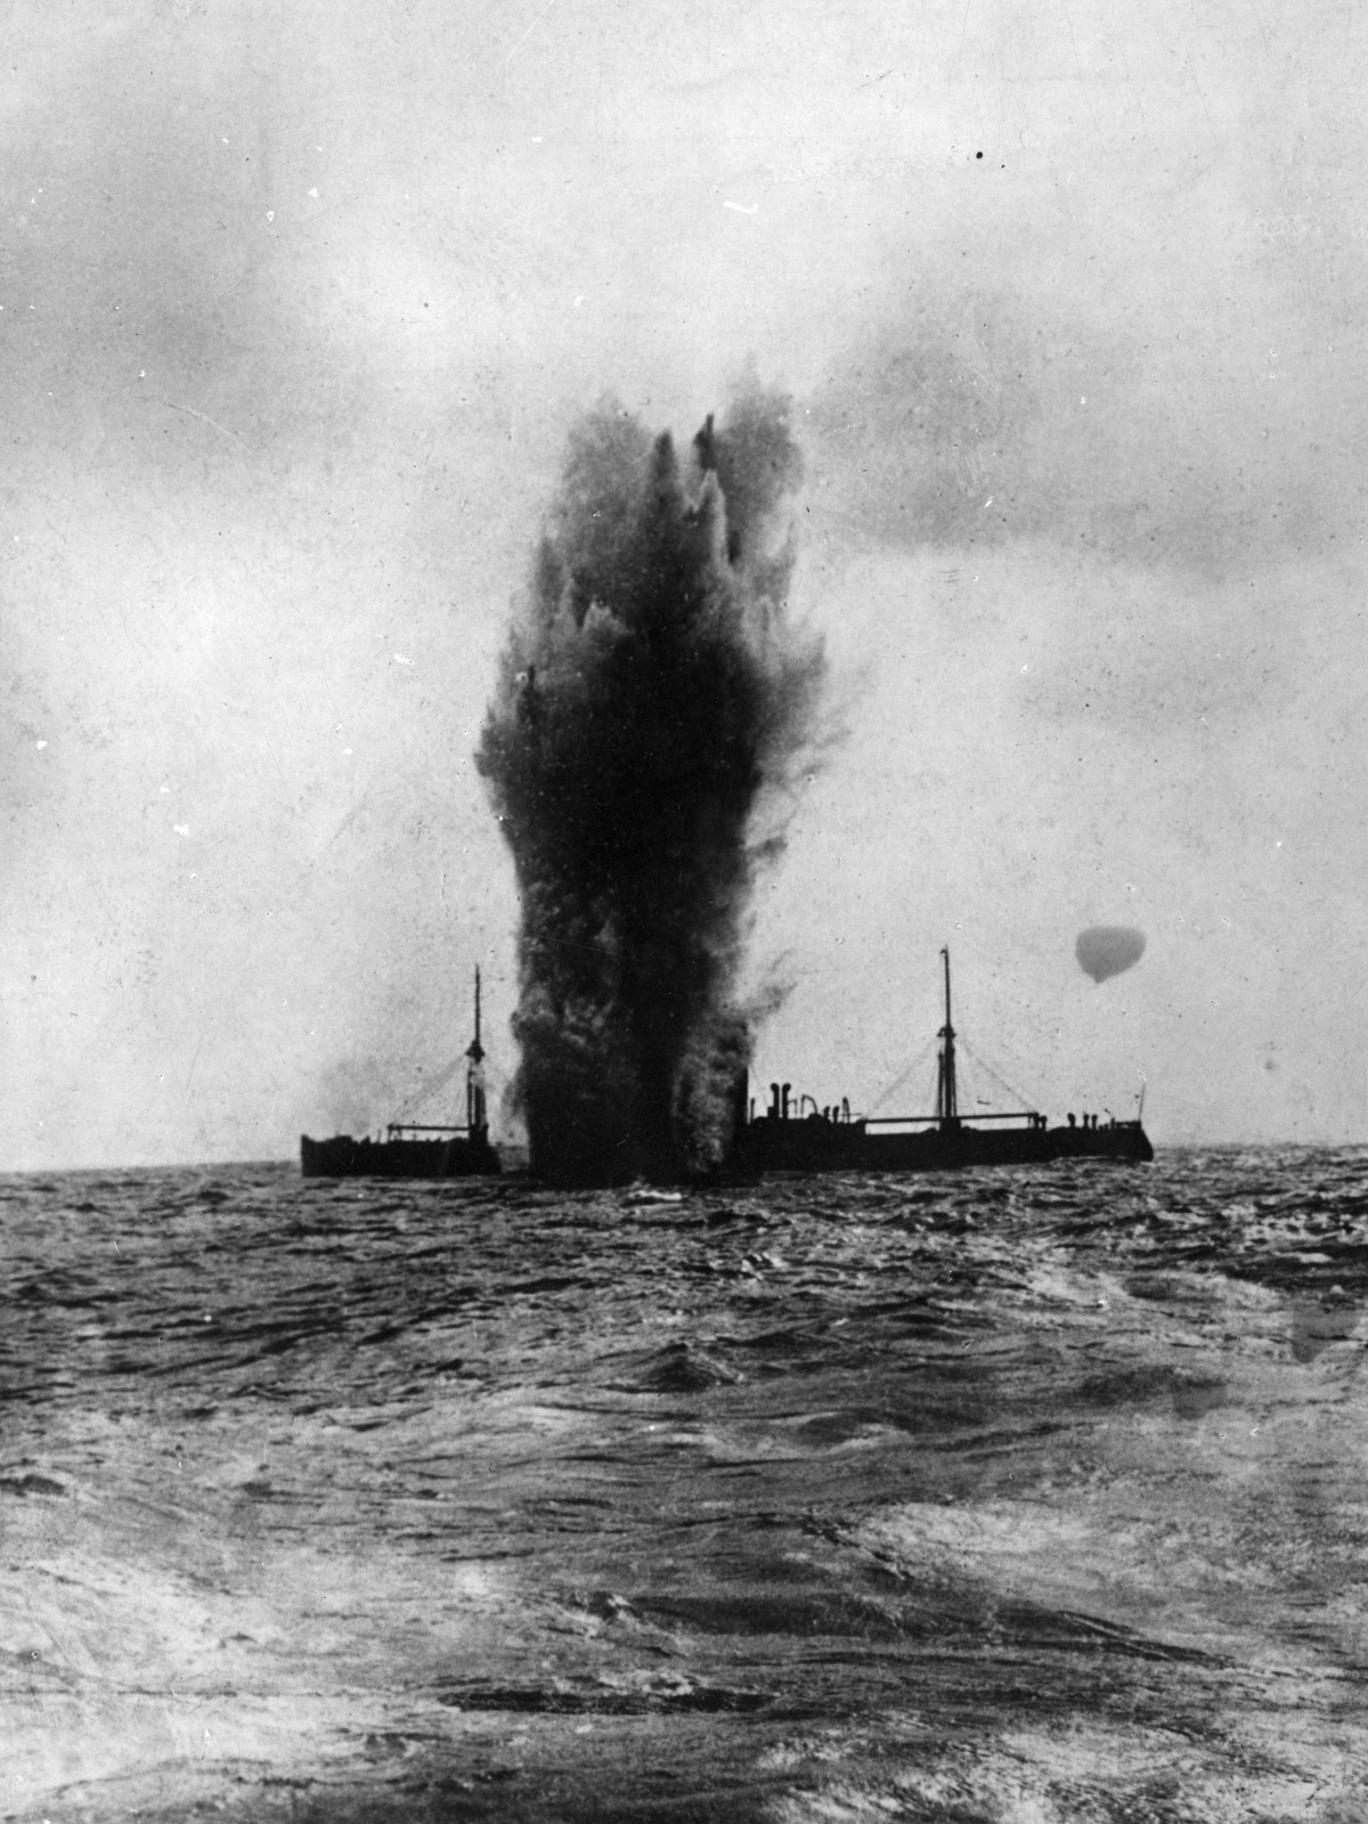 A steamer hit by a torpedo during the First World War